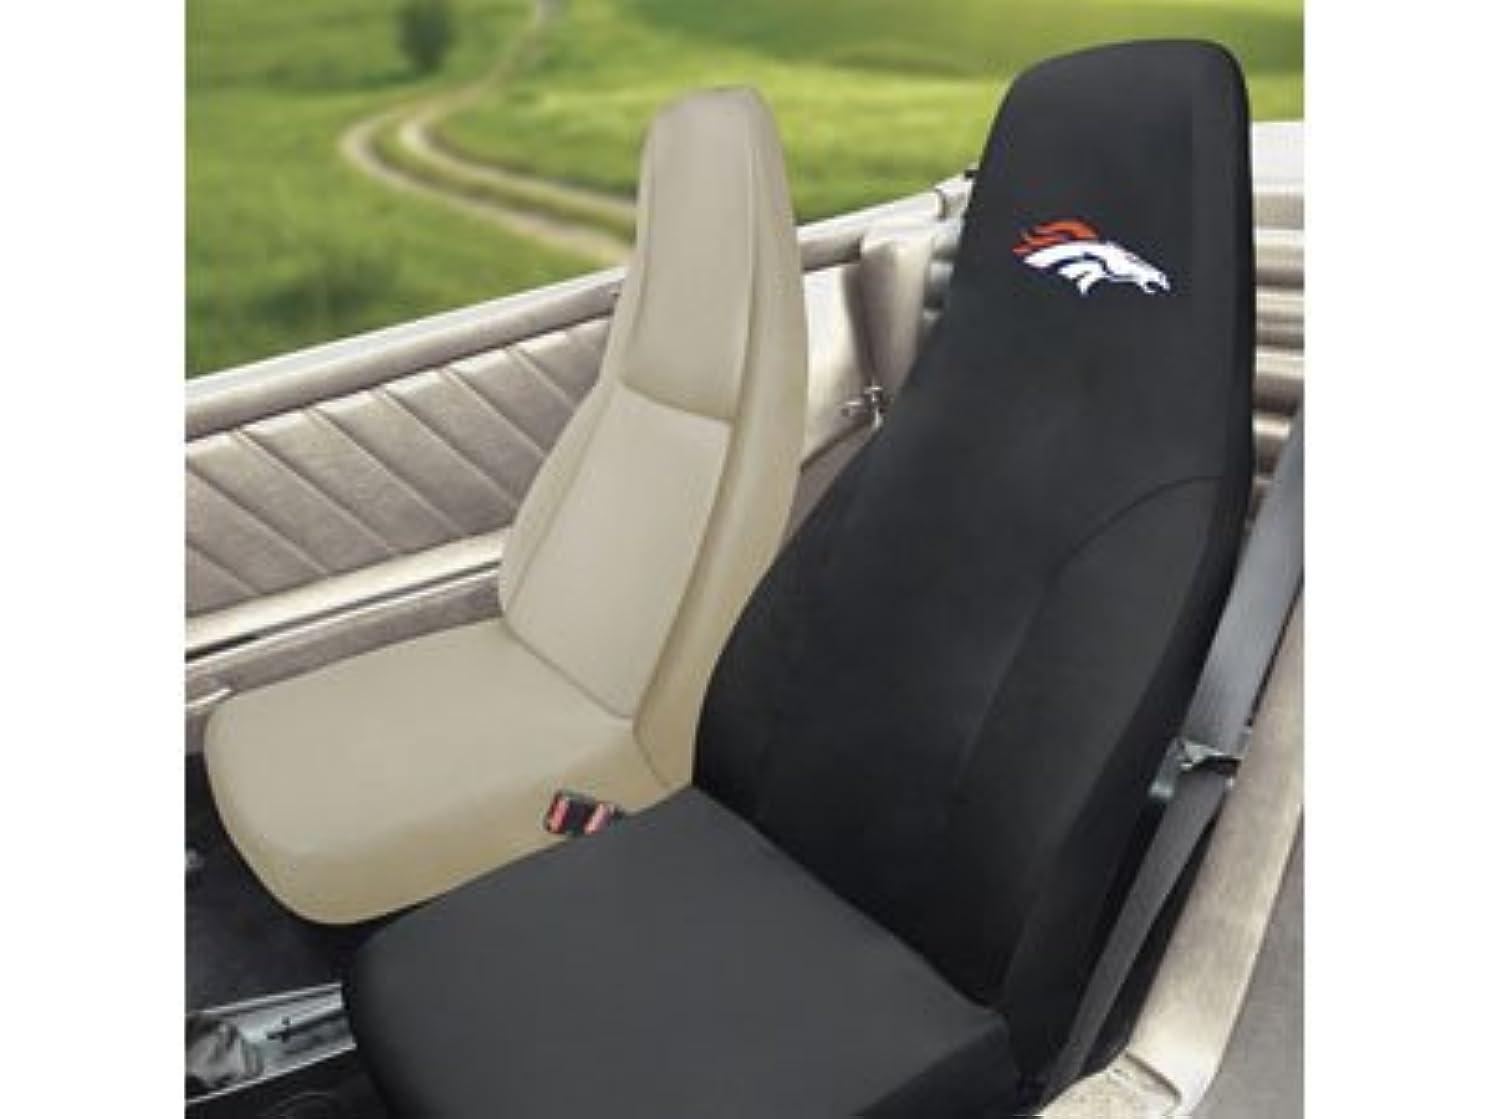 FANMATS 21516 Seat Cover NFL (Denver Broncos)